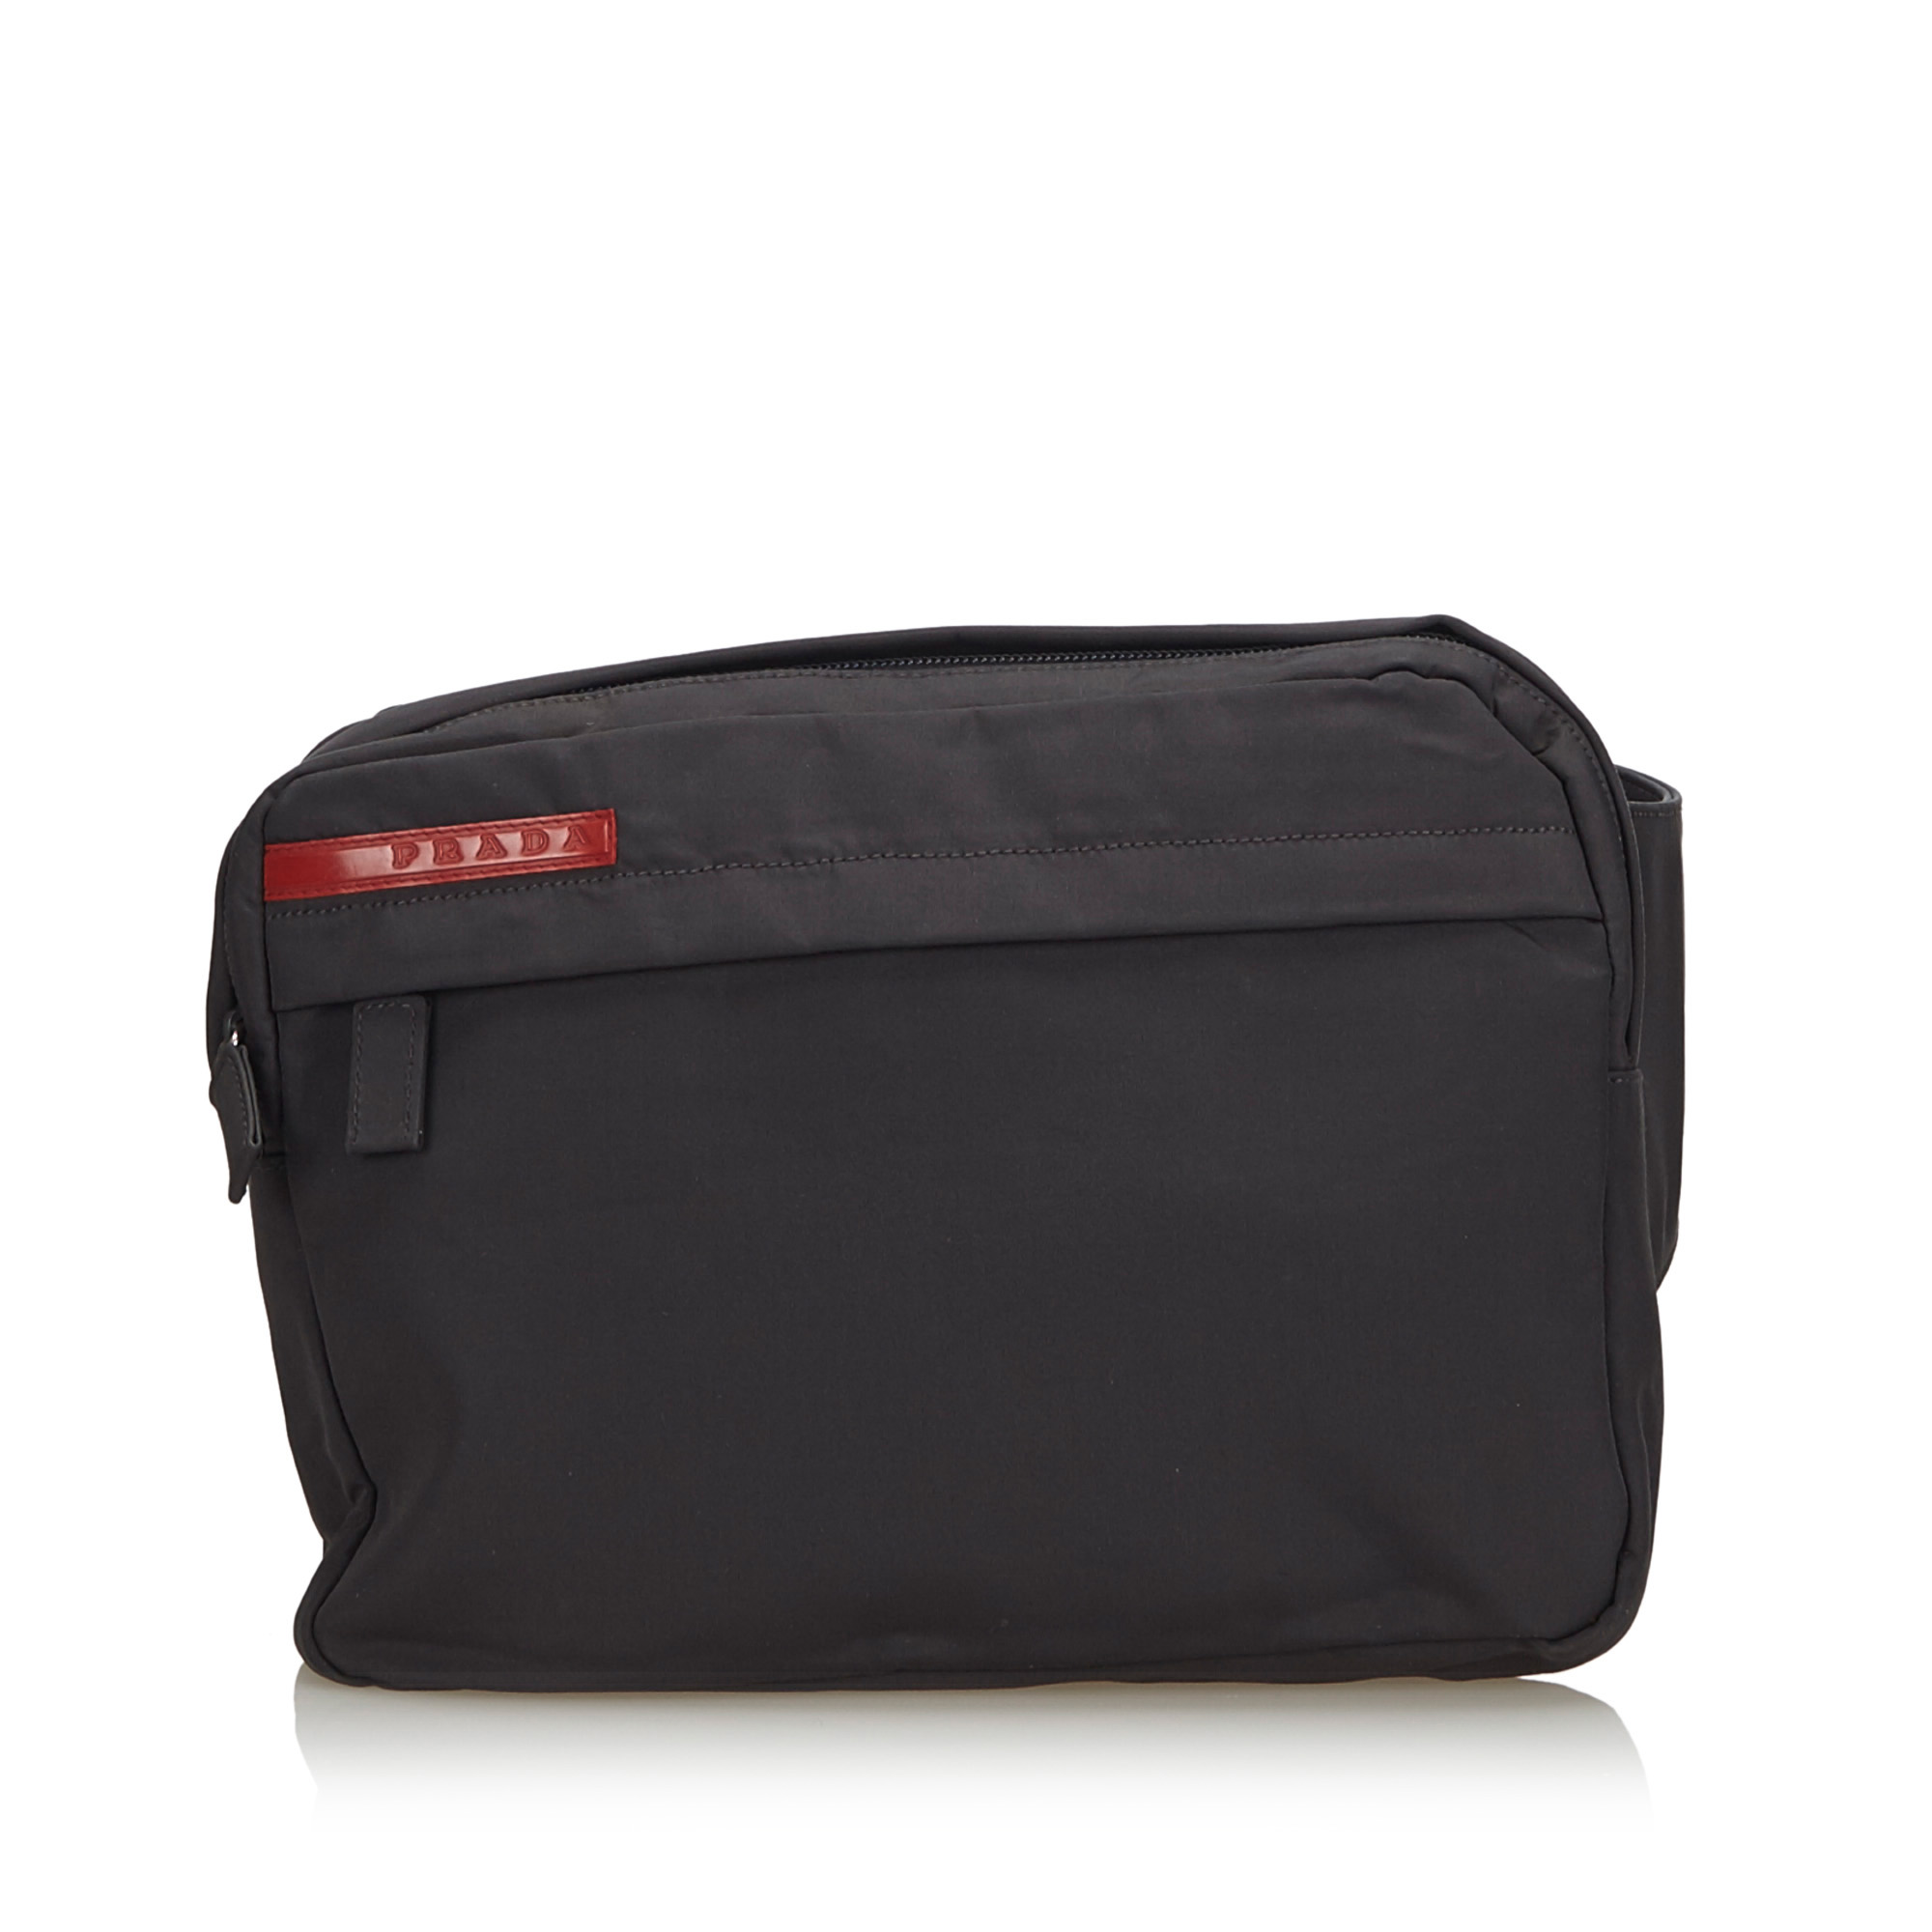 Marc Jacobs Sport Belt Bag Nylon Black i svart   fashionette